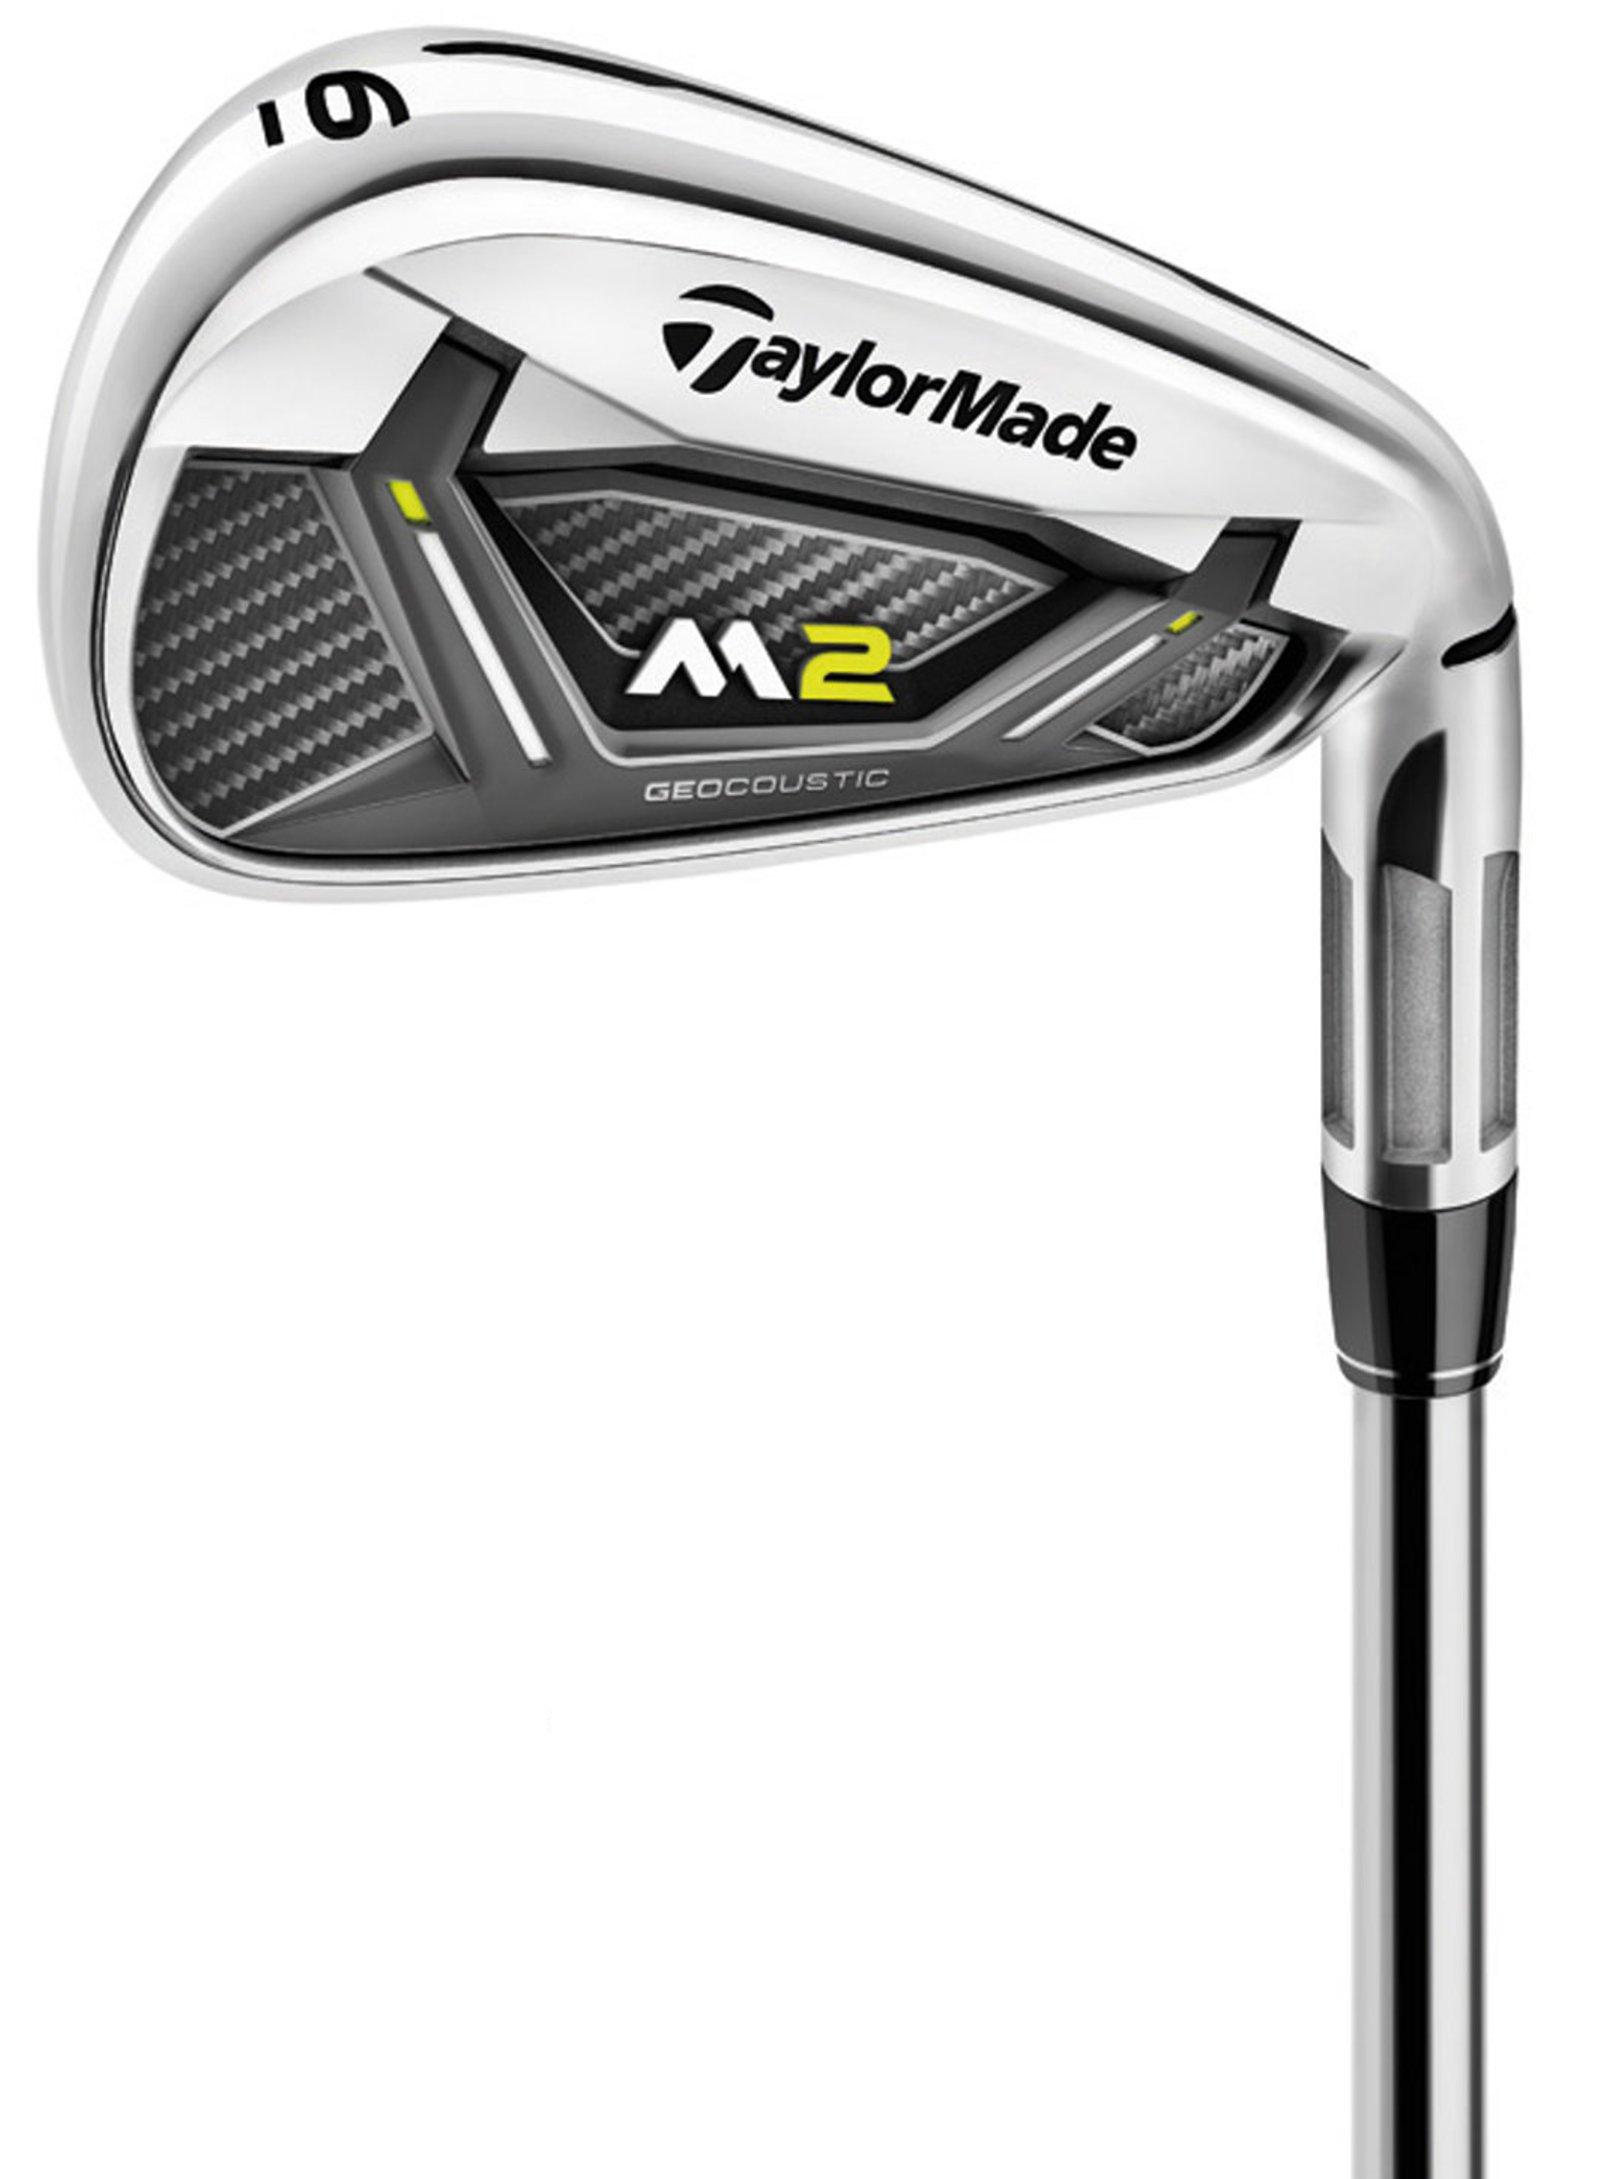 Taylormade Golf 2017 M2 Pitching Wedge PW 43.5 M2 REAX Graphite Mens RH Stiff